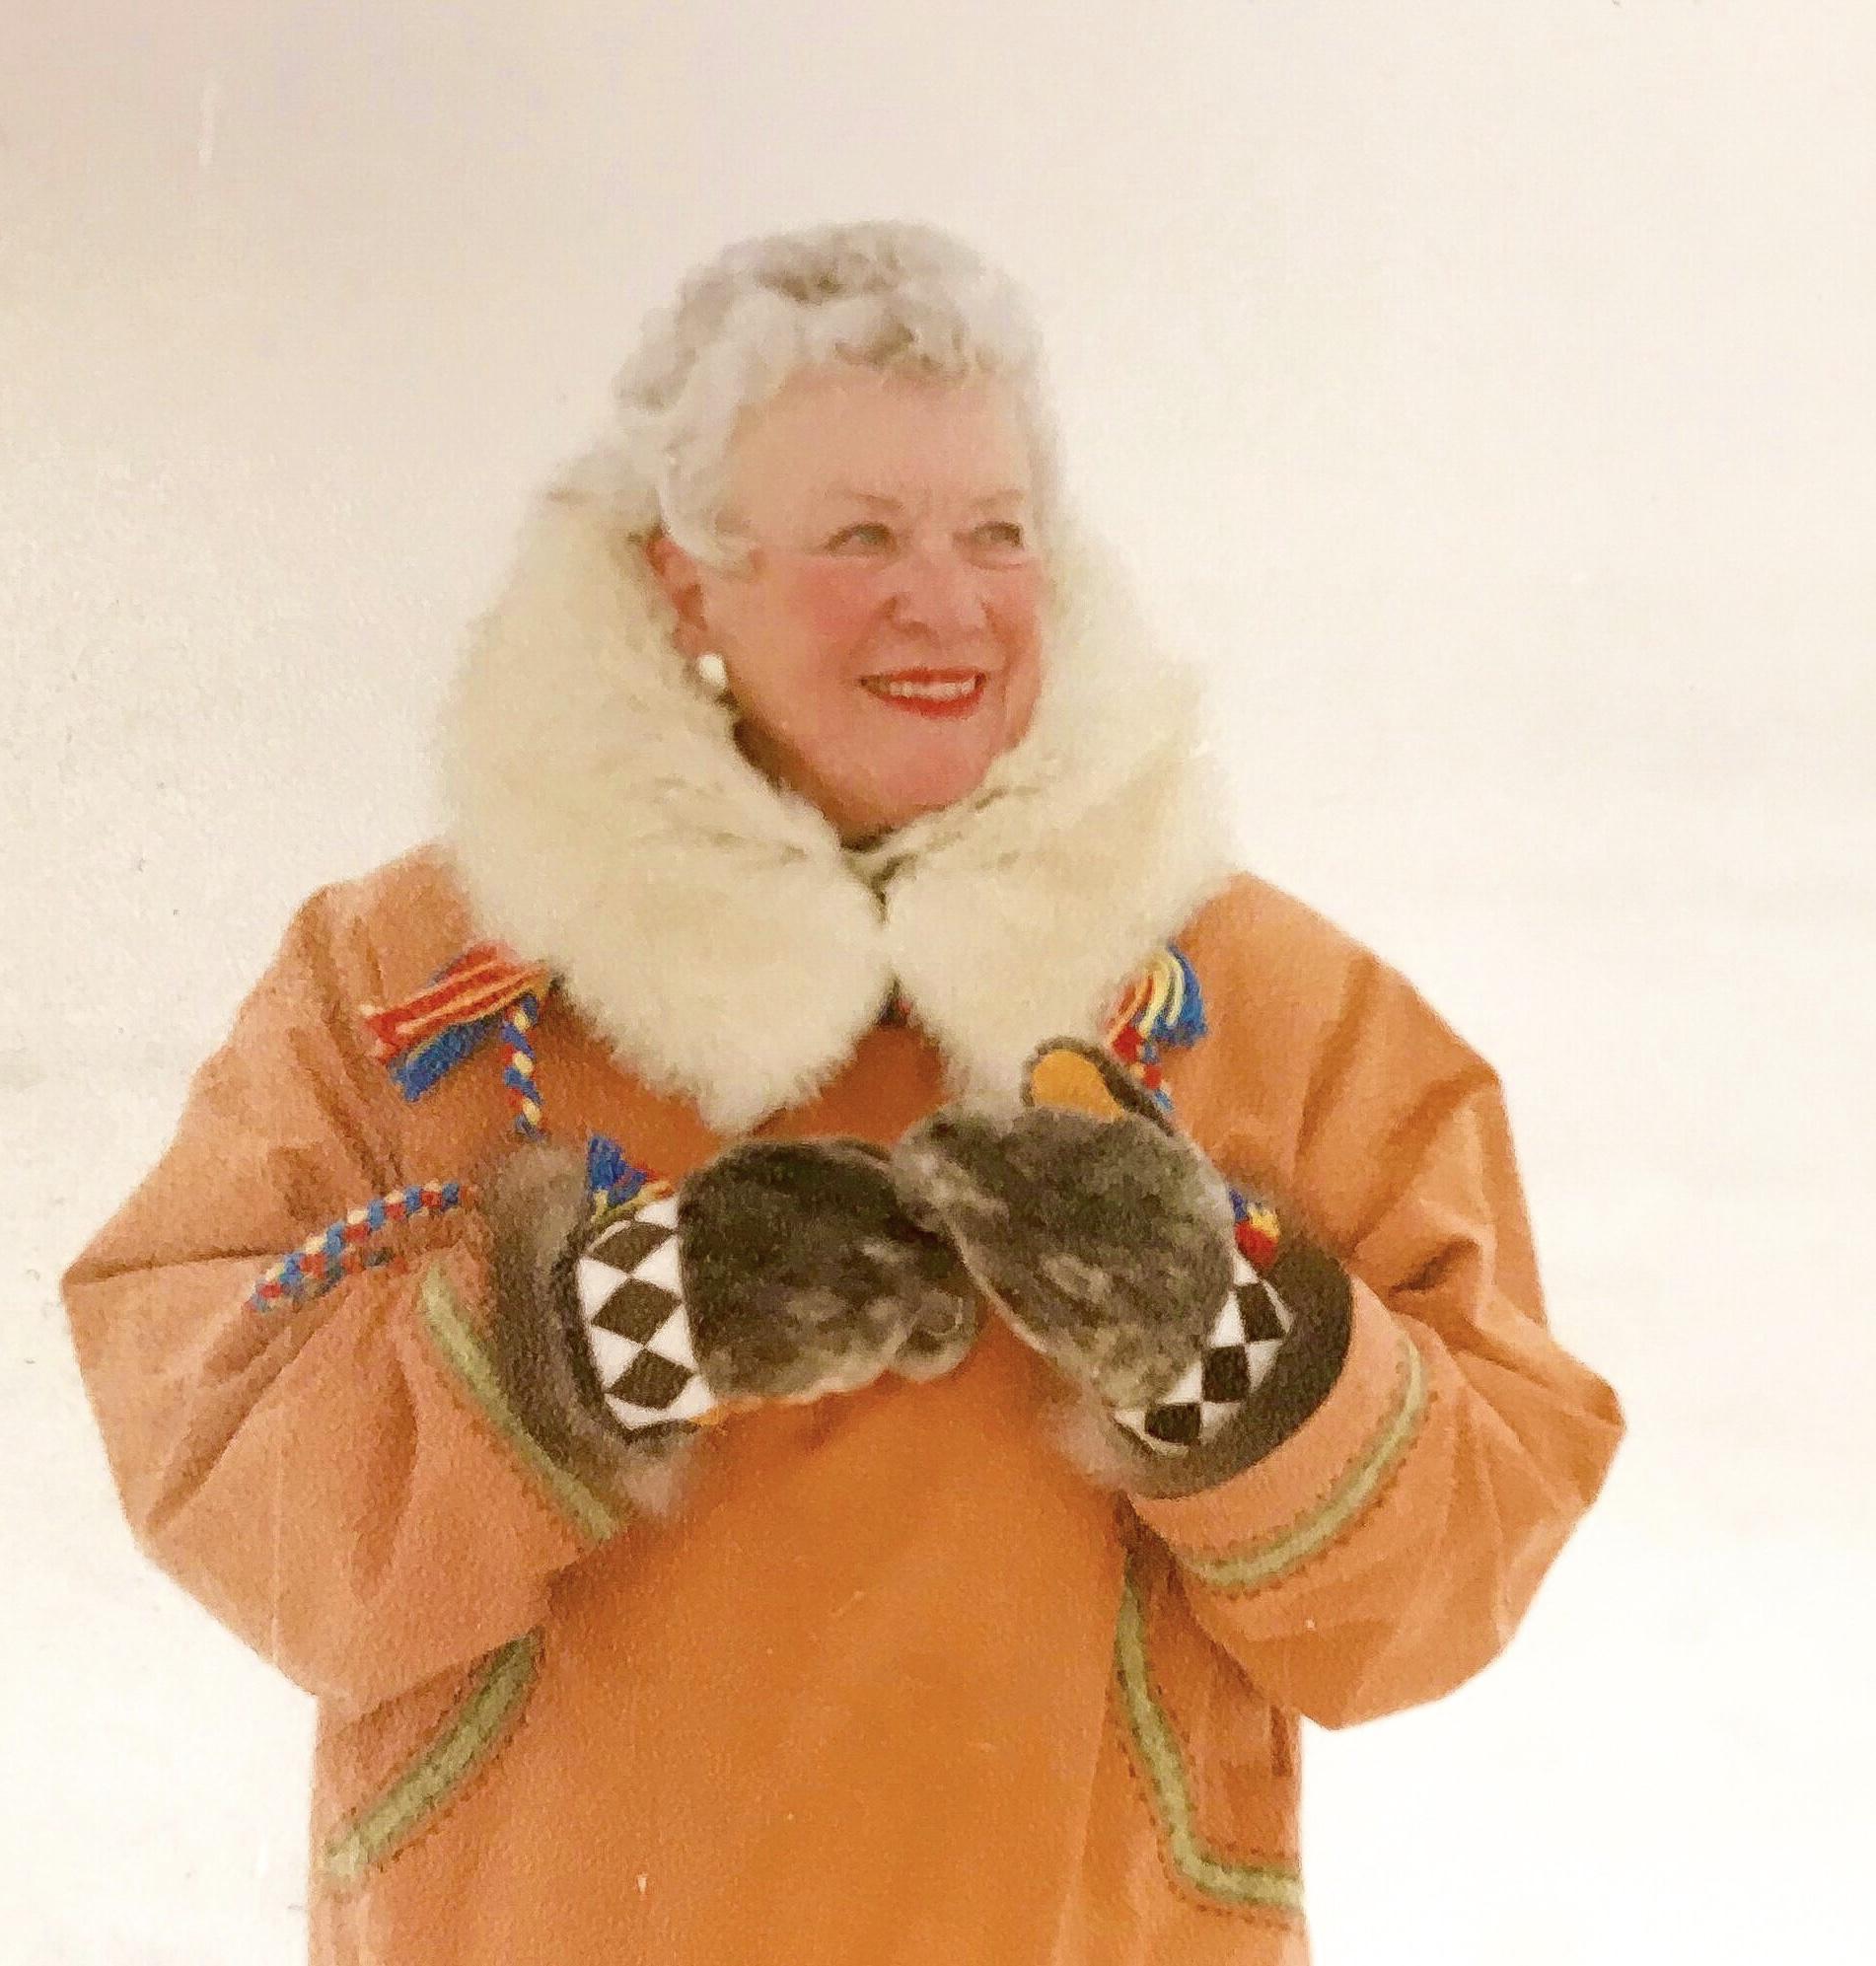 Jean Craighead George in [[Barrow, AK]], 1994